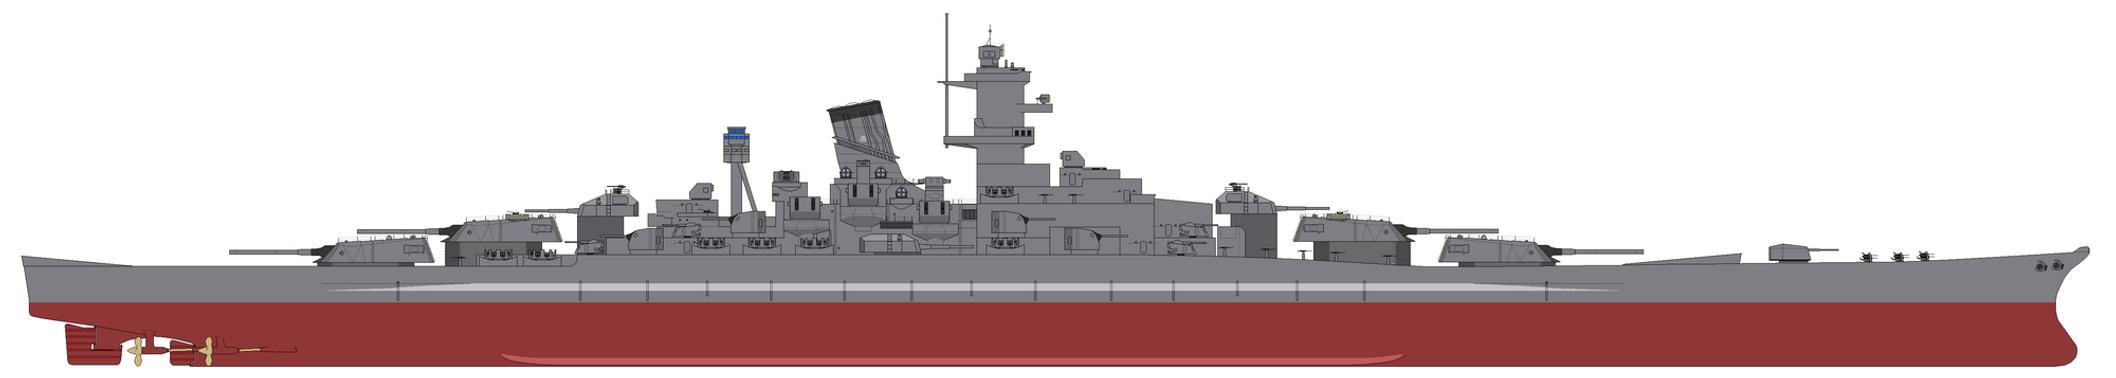 UHS Tirpitz by SenkanYamato